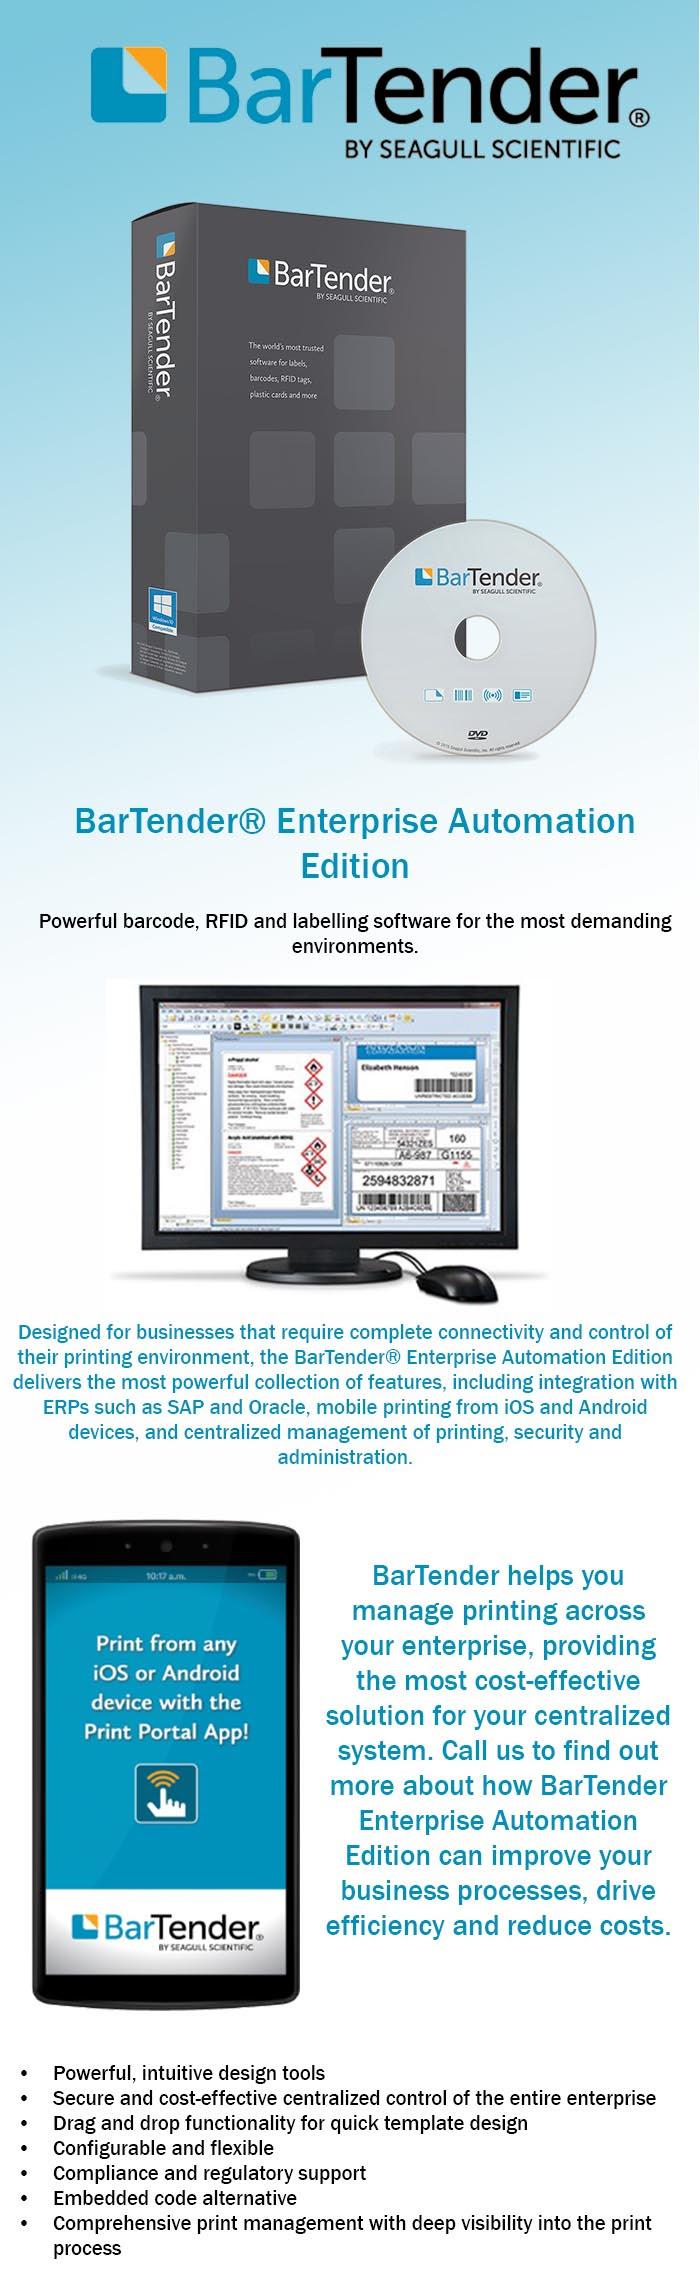 The BarTender 2016 Enterprise Automation Edition Software